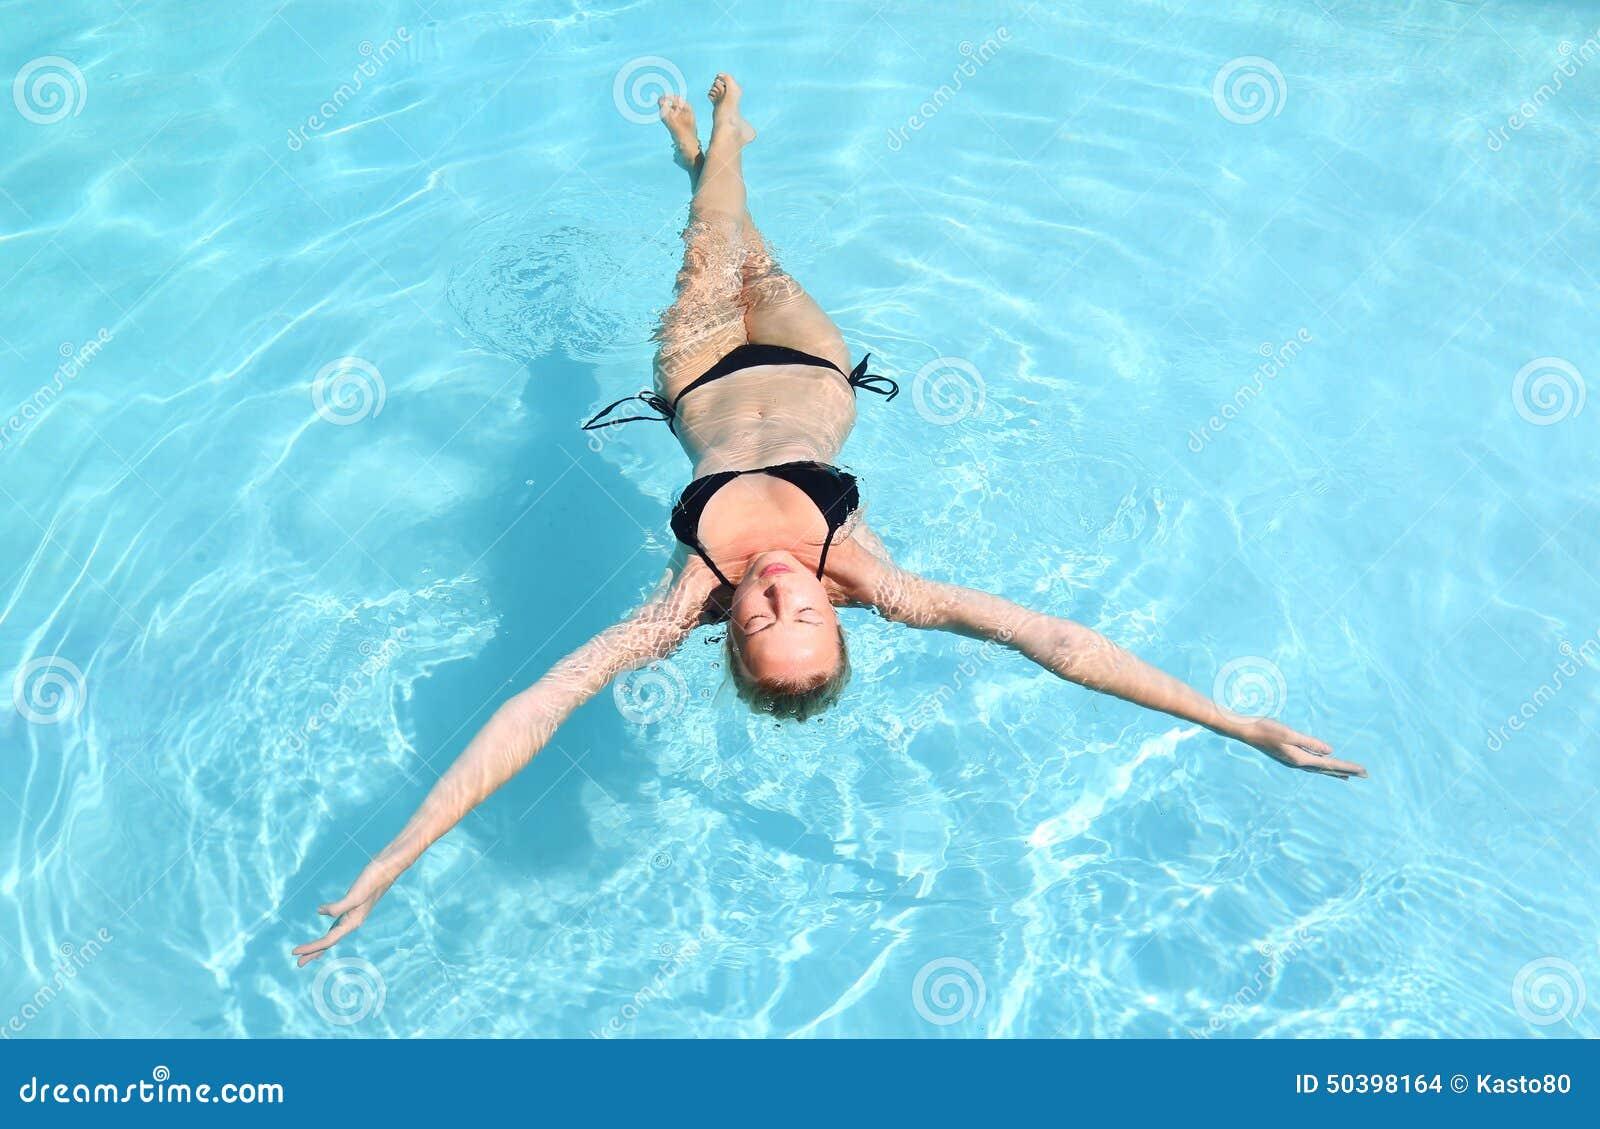 Senior Lady Swimming In Pool Royalty Free Stock Image - Image ...